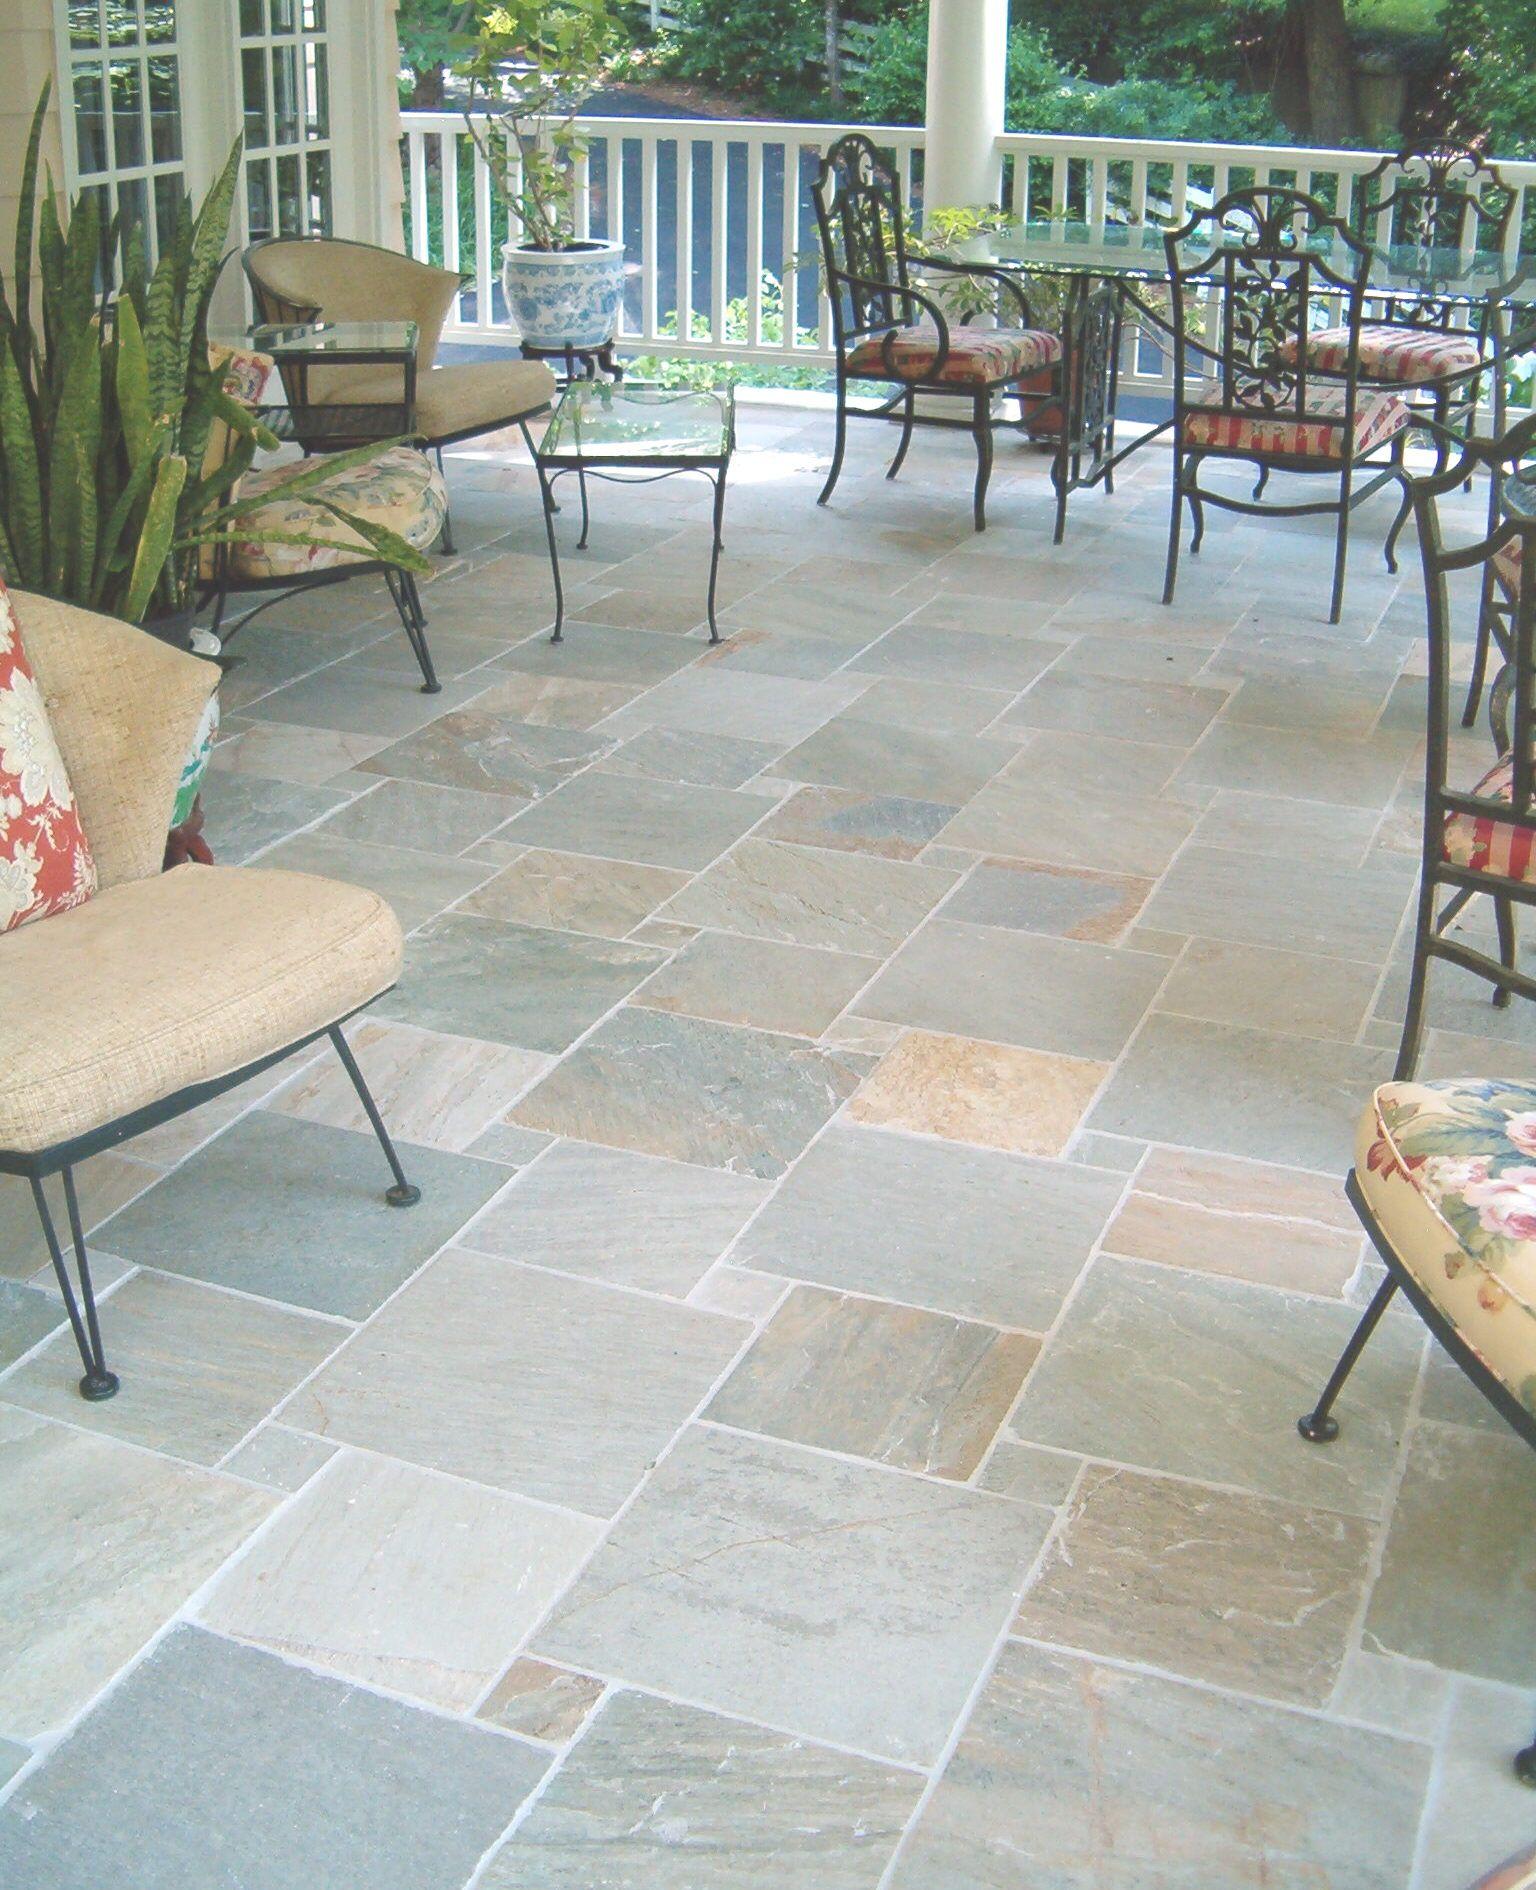 The slate tile on this allseason porch makes maintenance